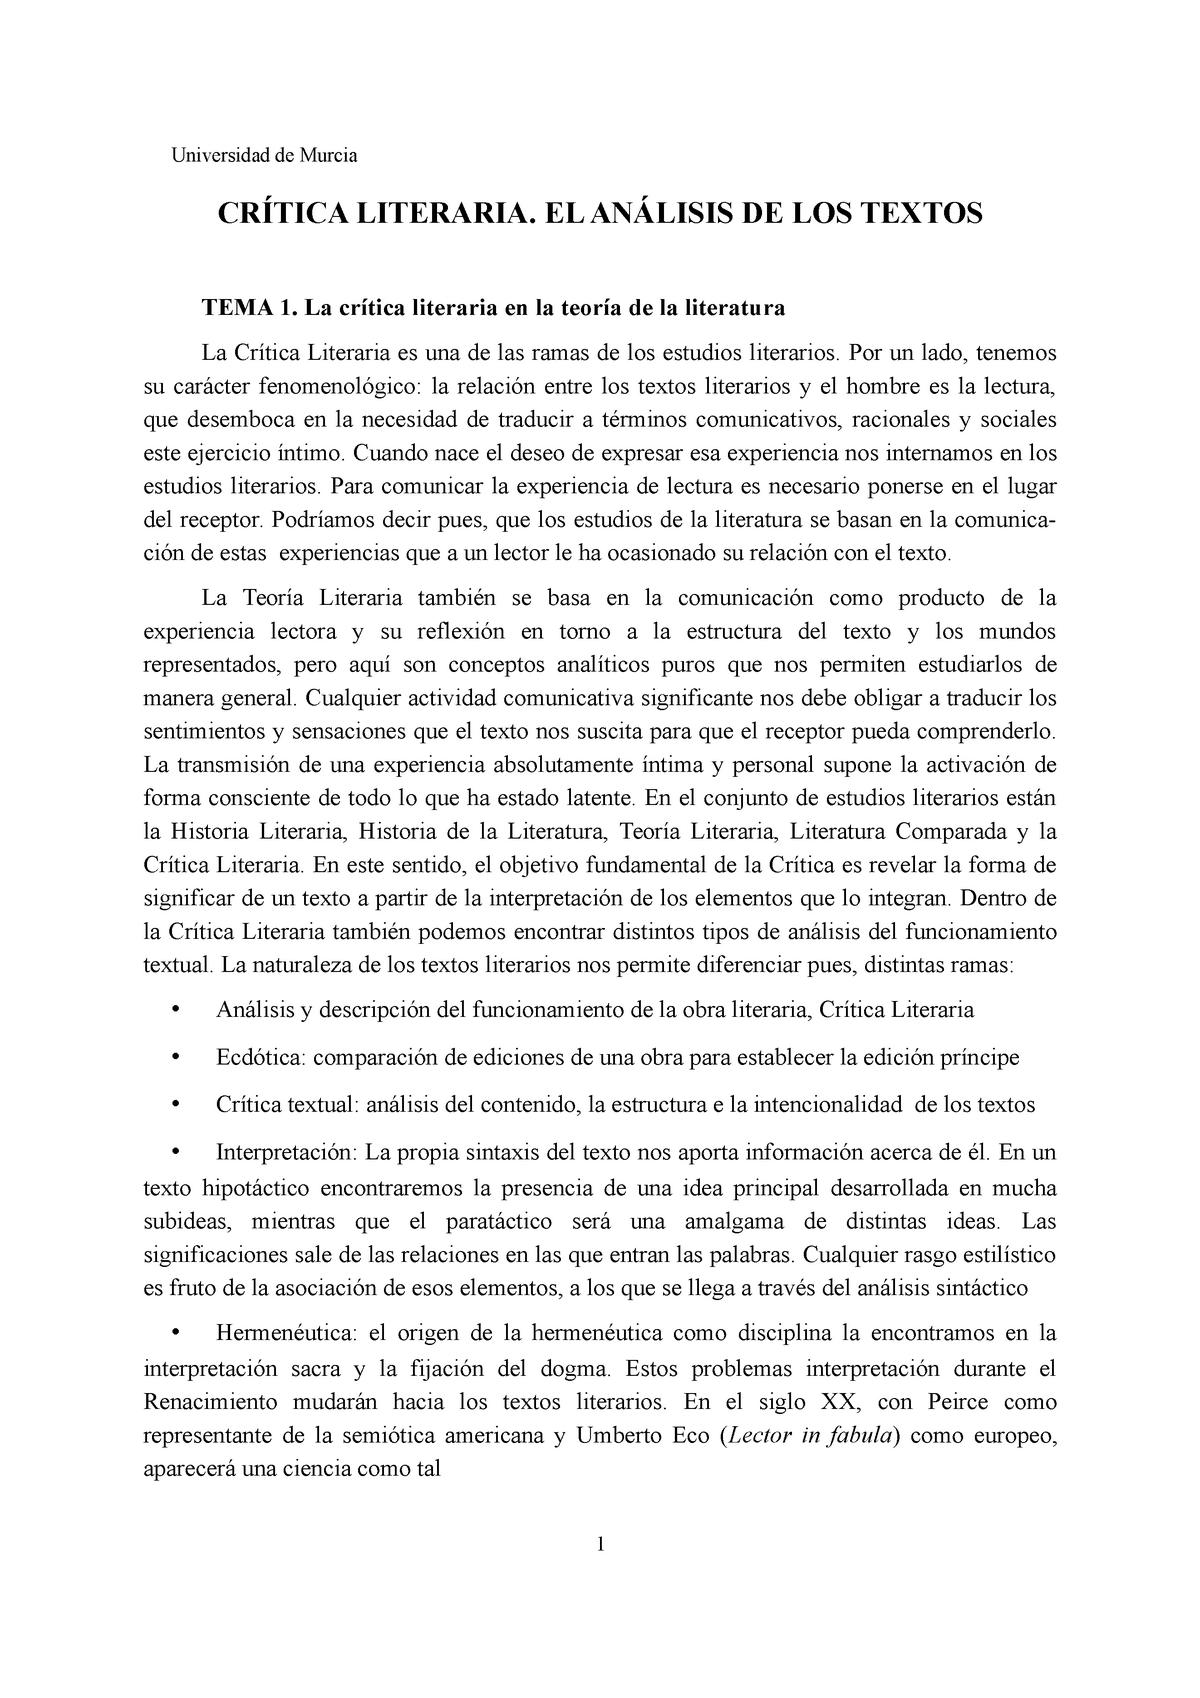 Crítica Literaria El Análisis De Los Textos I 1277 Um